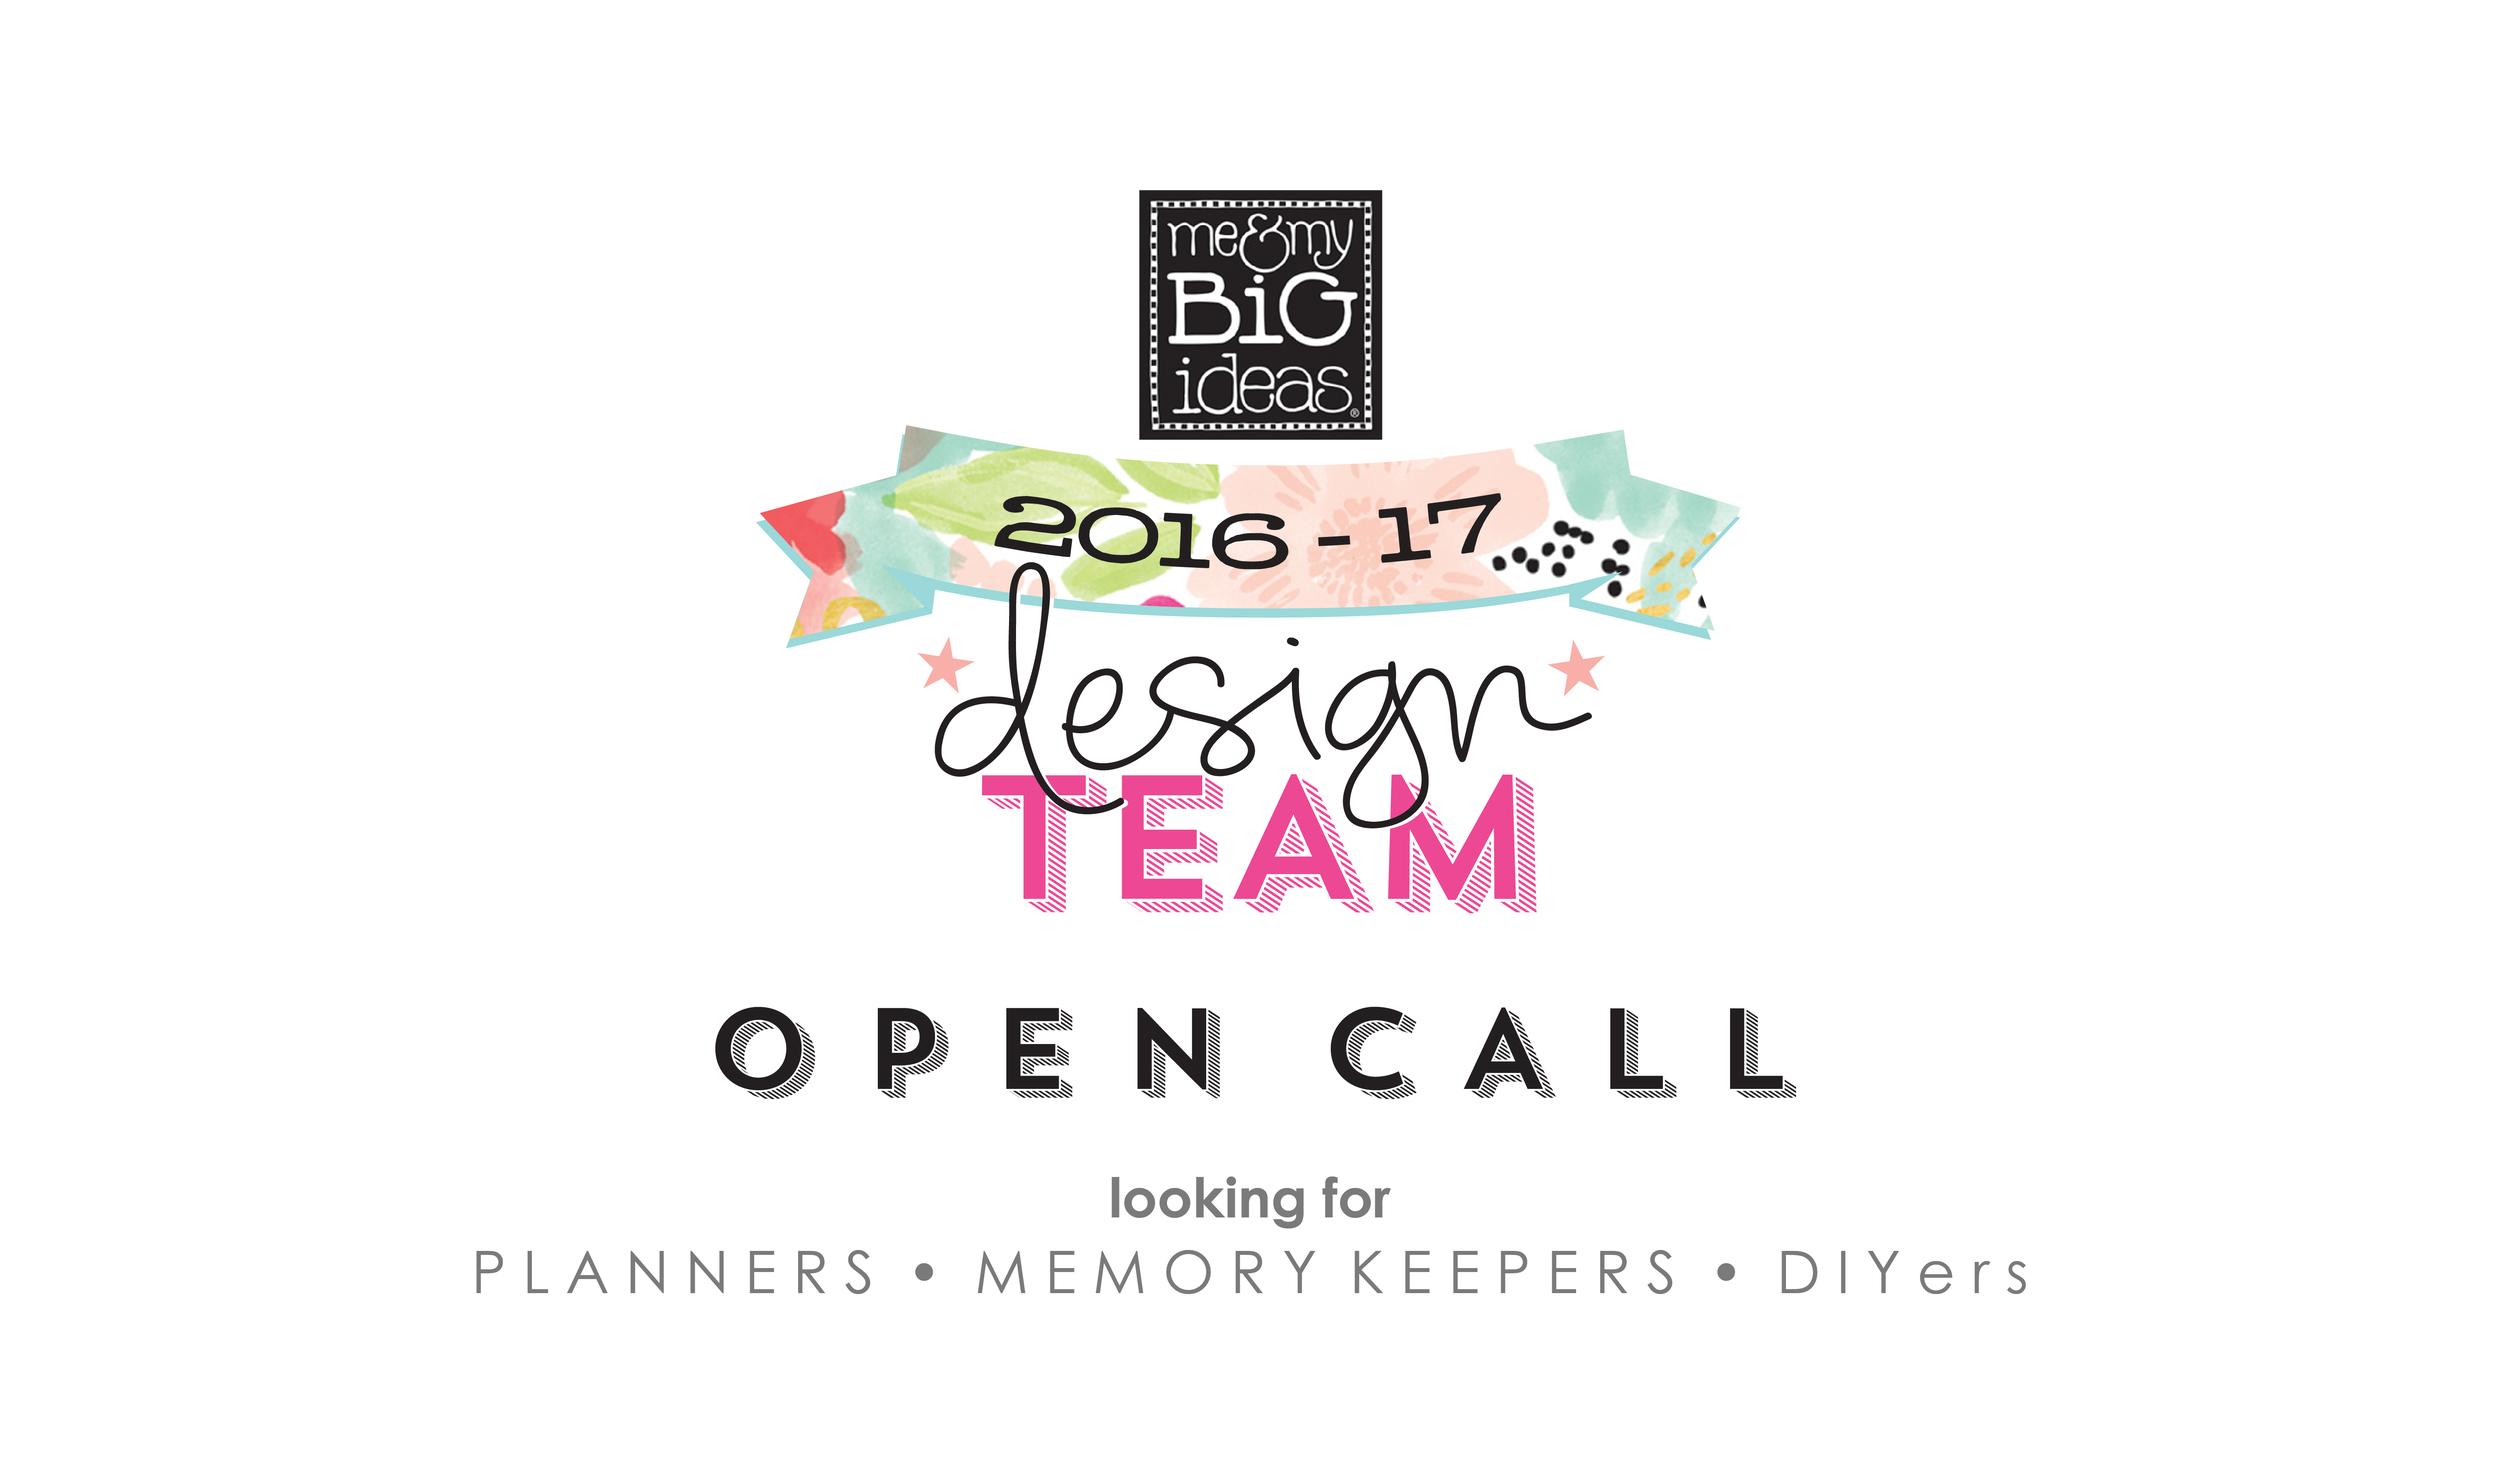 mambi 2016-2017 Design Team OPEN CALL !!! | me & my BIG ideas